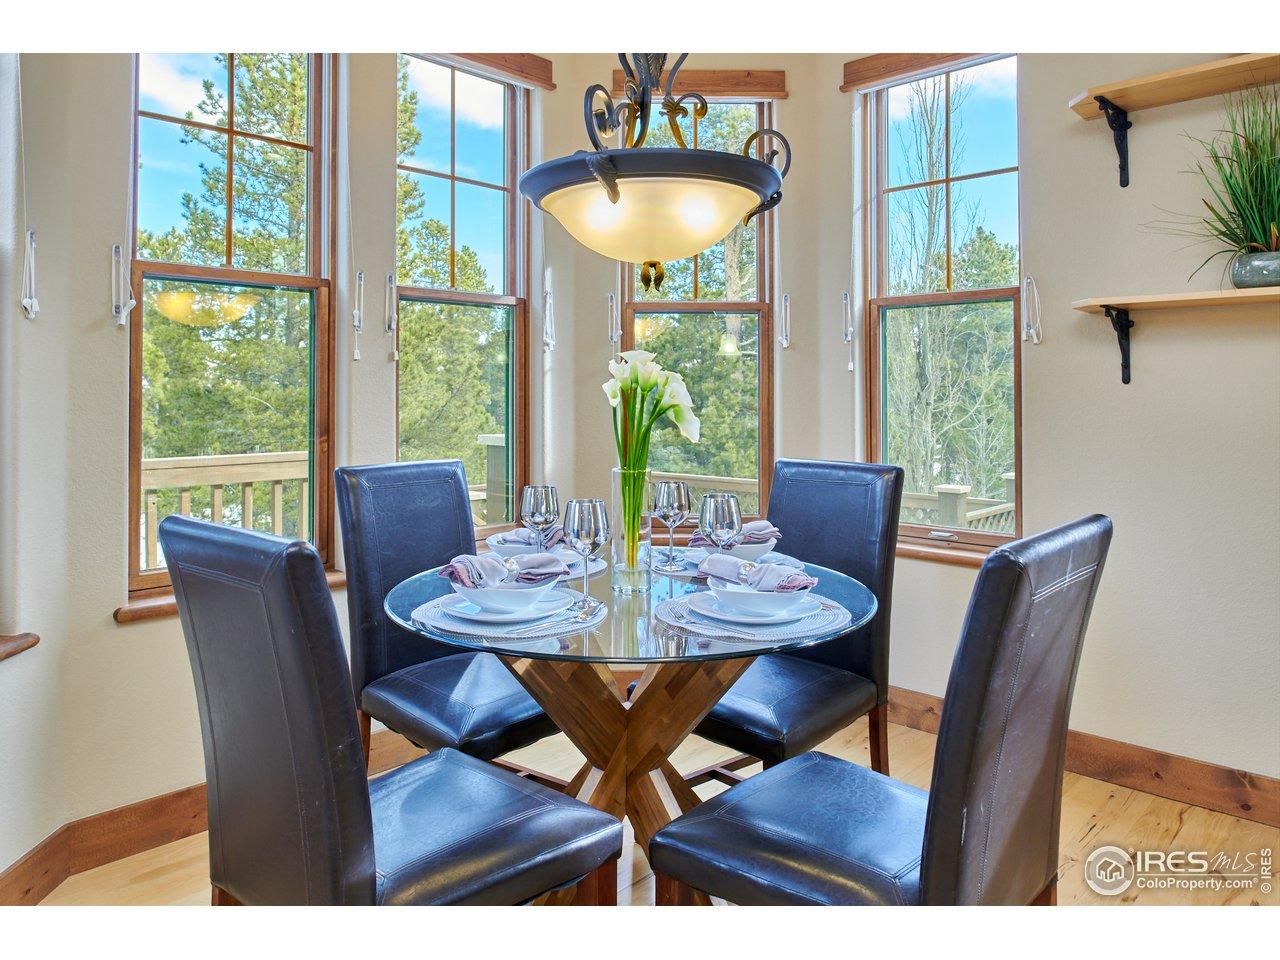 Sunlit informal dining room